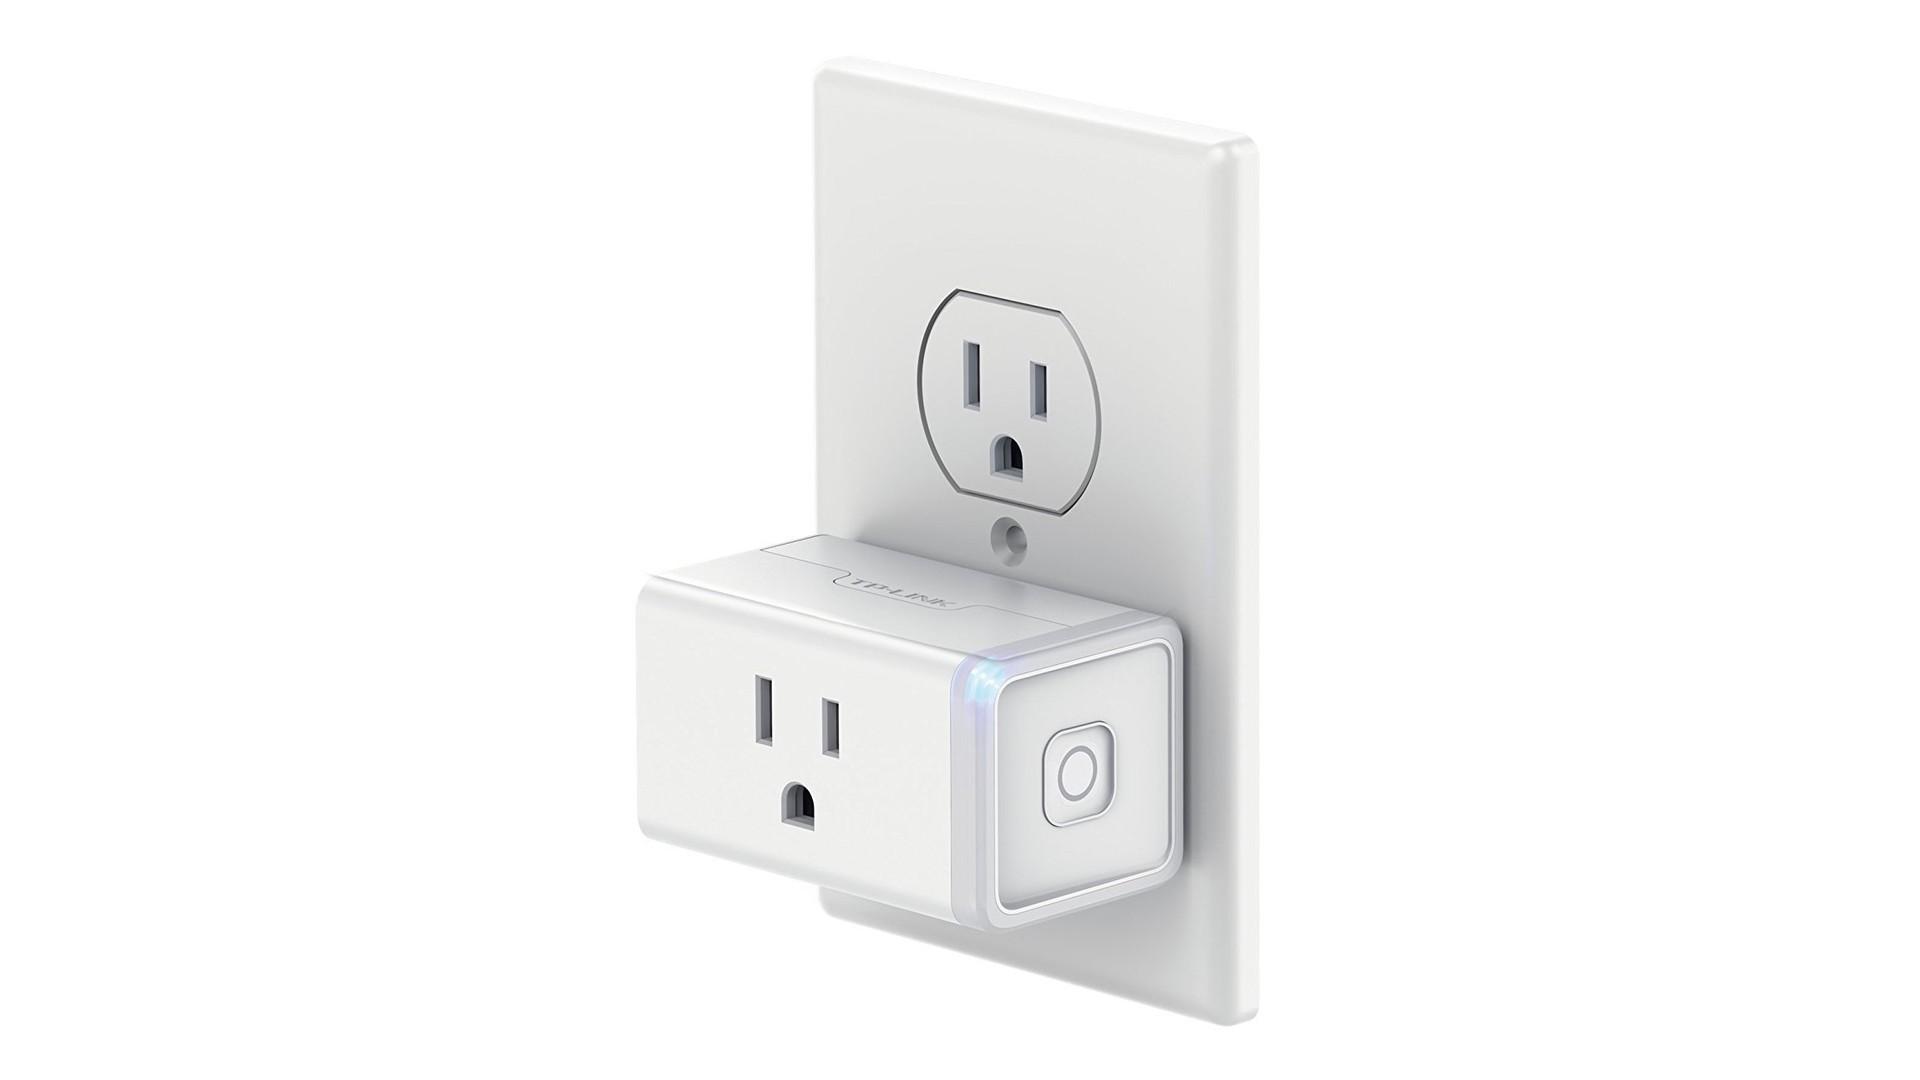 TP Link Kasa Smart WiFi Plug Mini